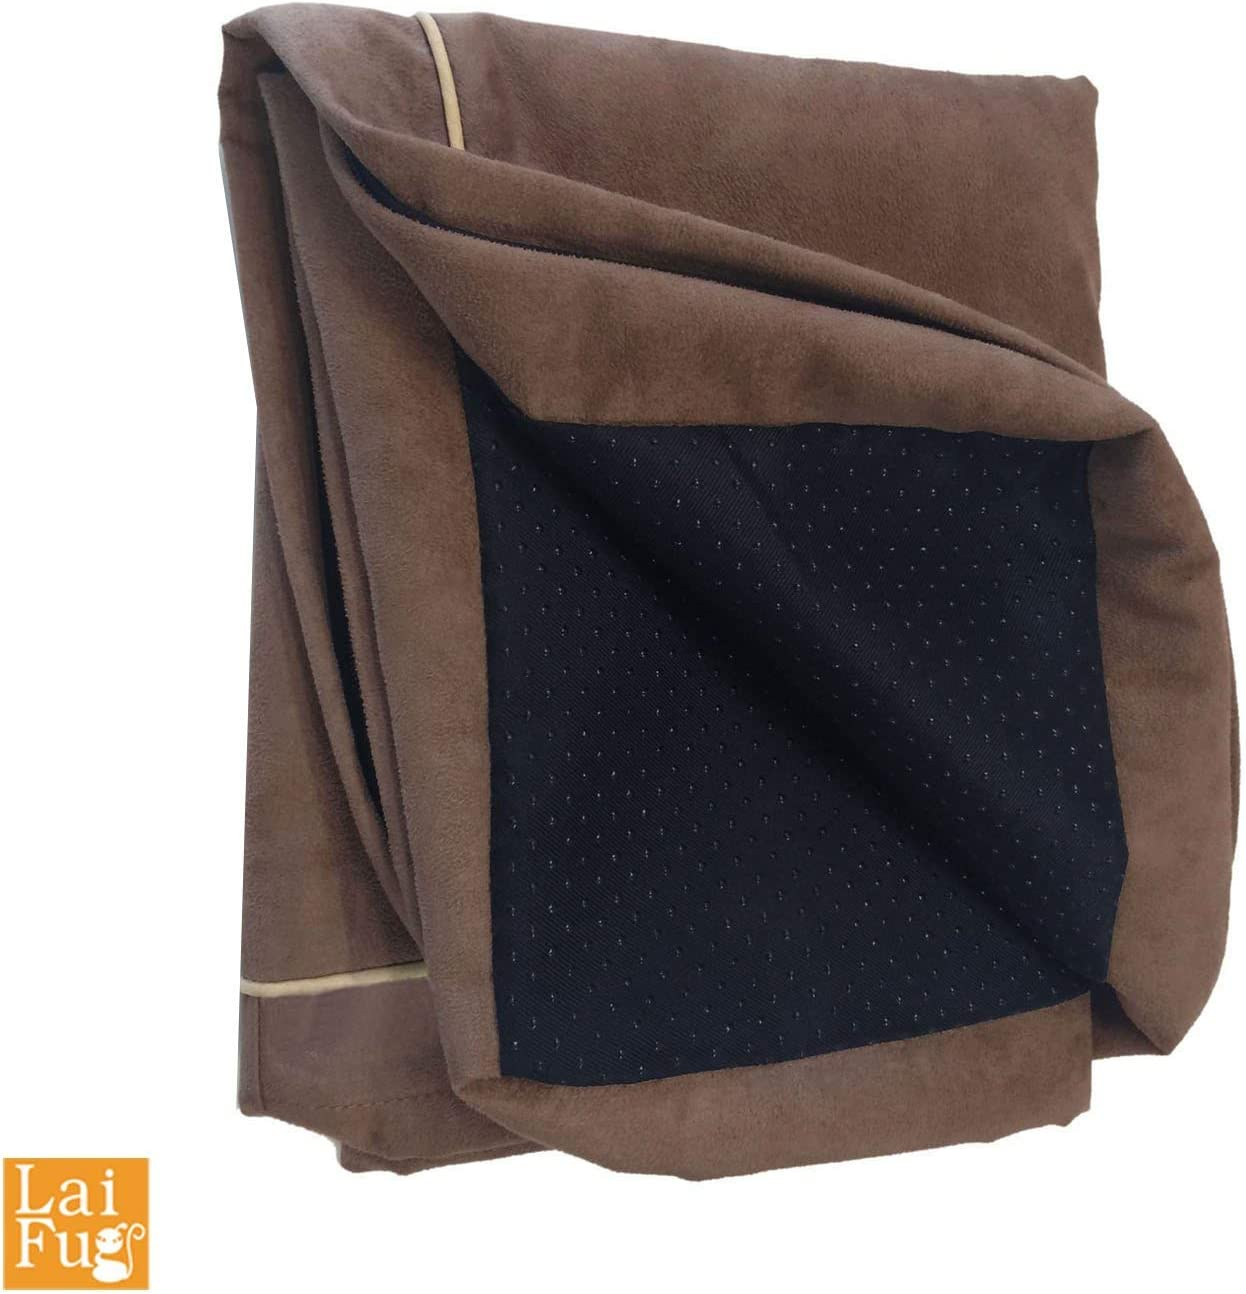 Laifug Premium Removable Washable Cover